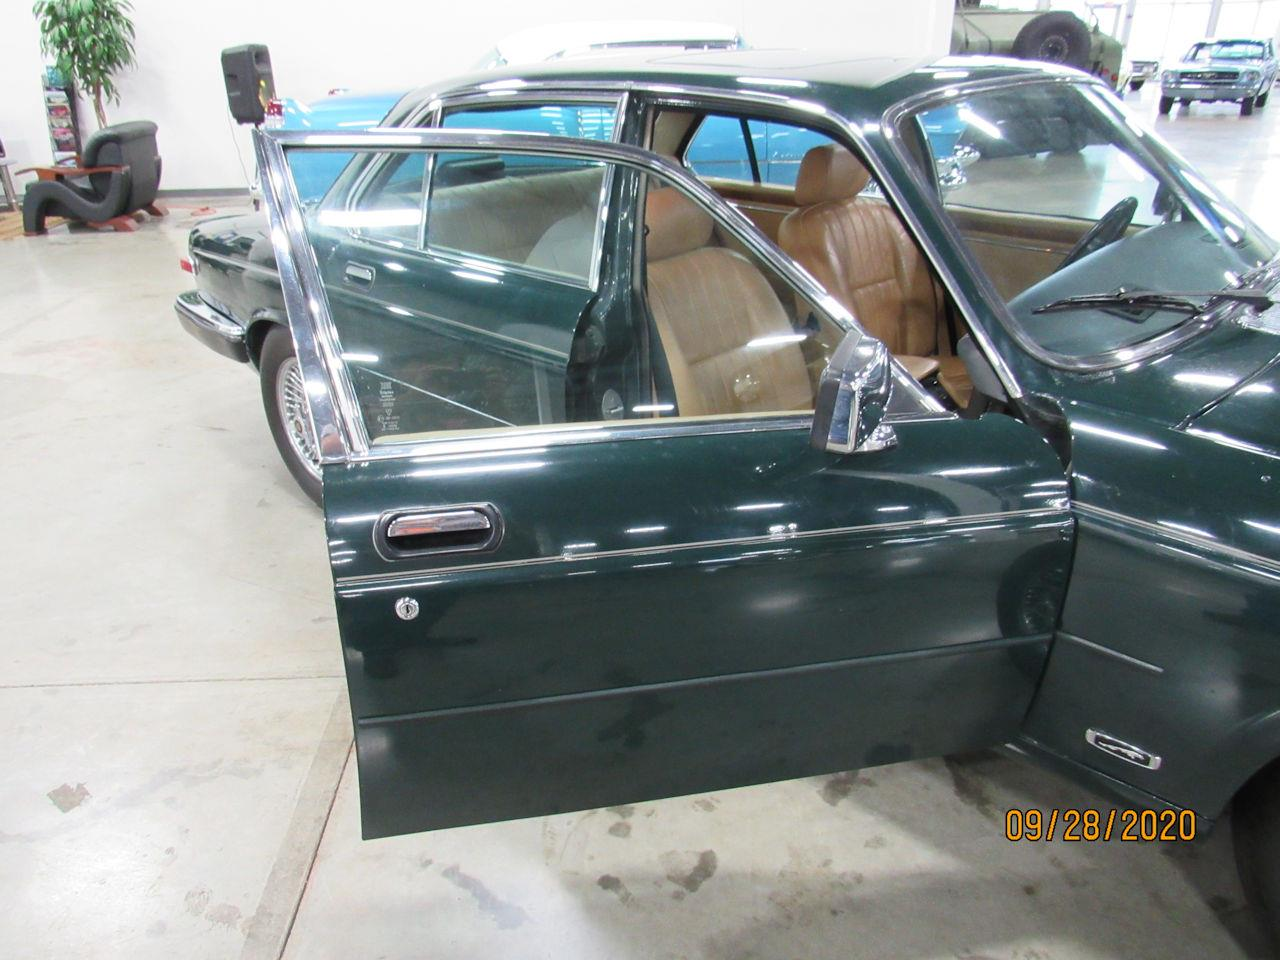 1987 Jaguar XJ6 (CC-1418314) for sale in O'Fallon, Illinois